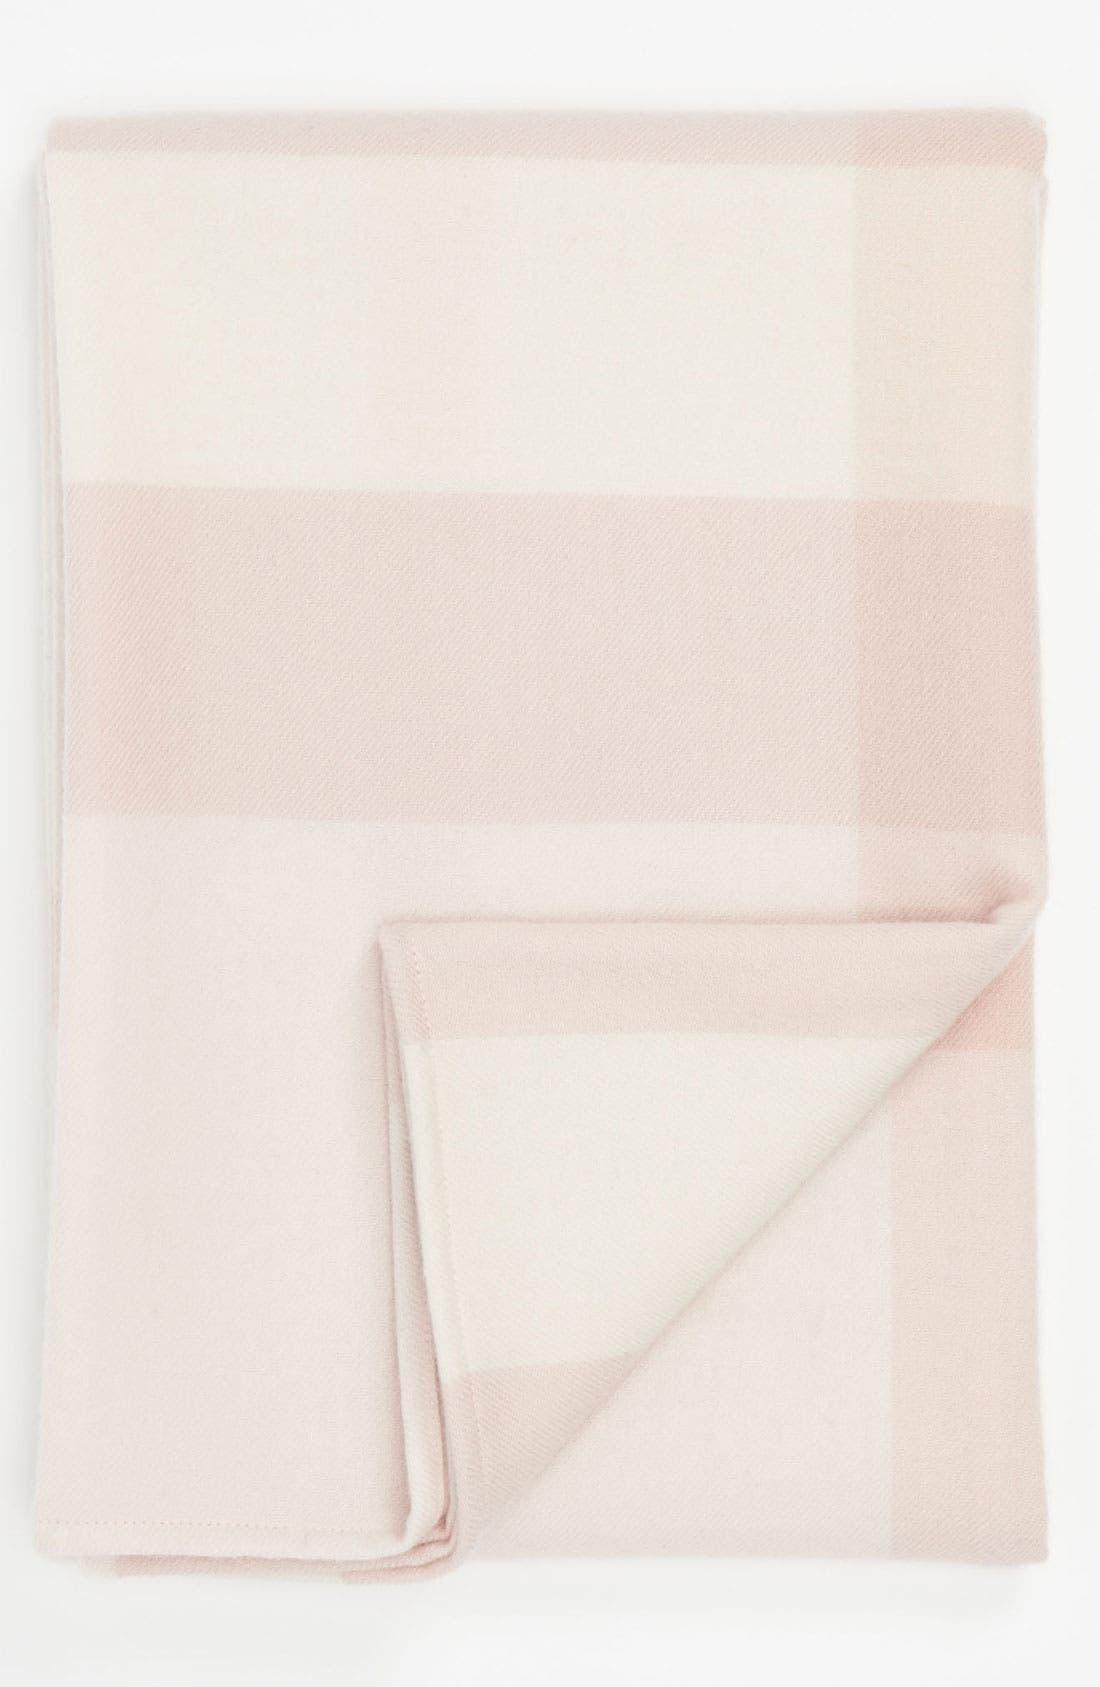 Check Merino Wool Blanket,                             Main thumbnail 1, color,                             681